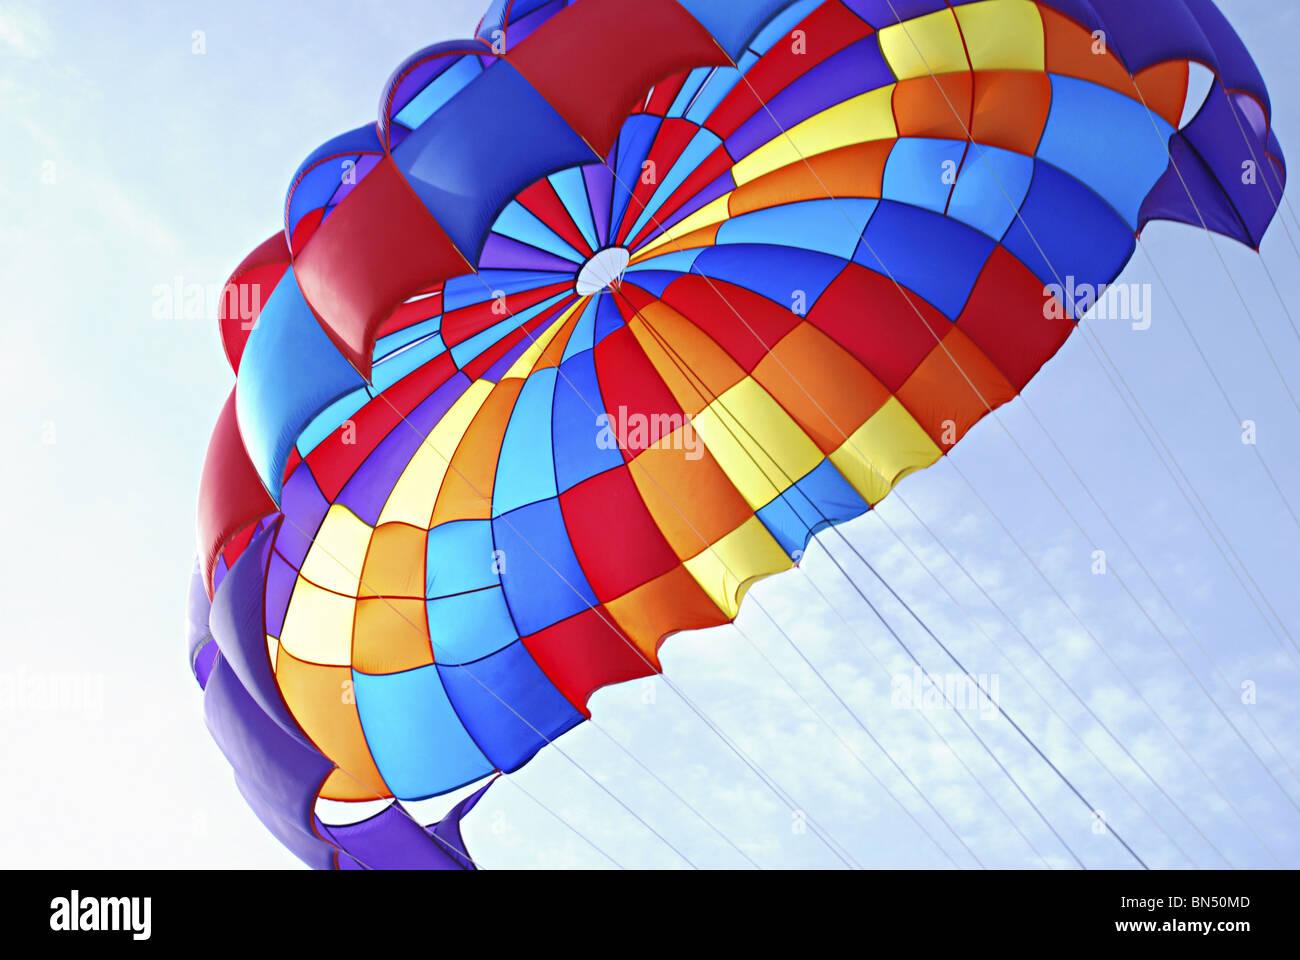 Un gros plan du parasailing umbrella Banque D'Images